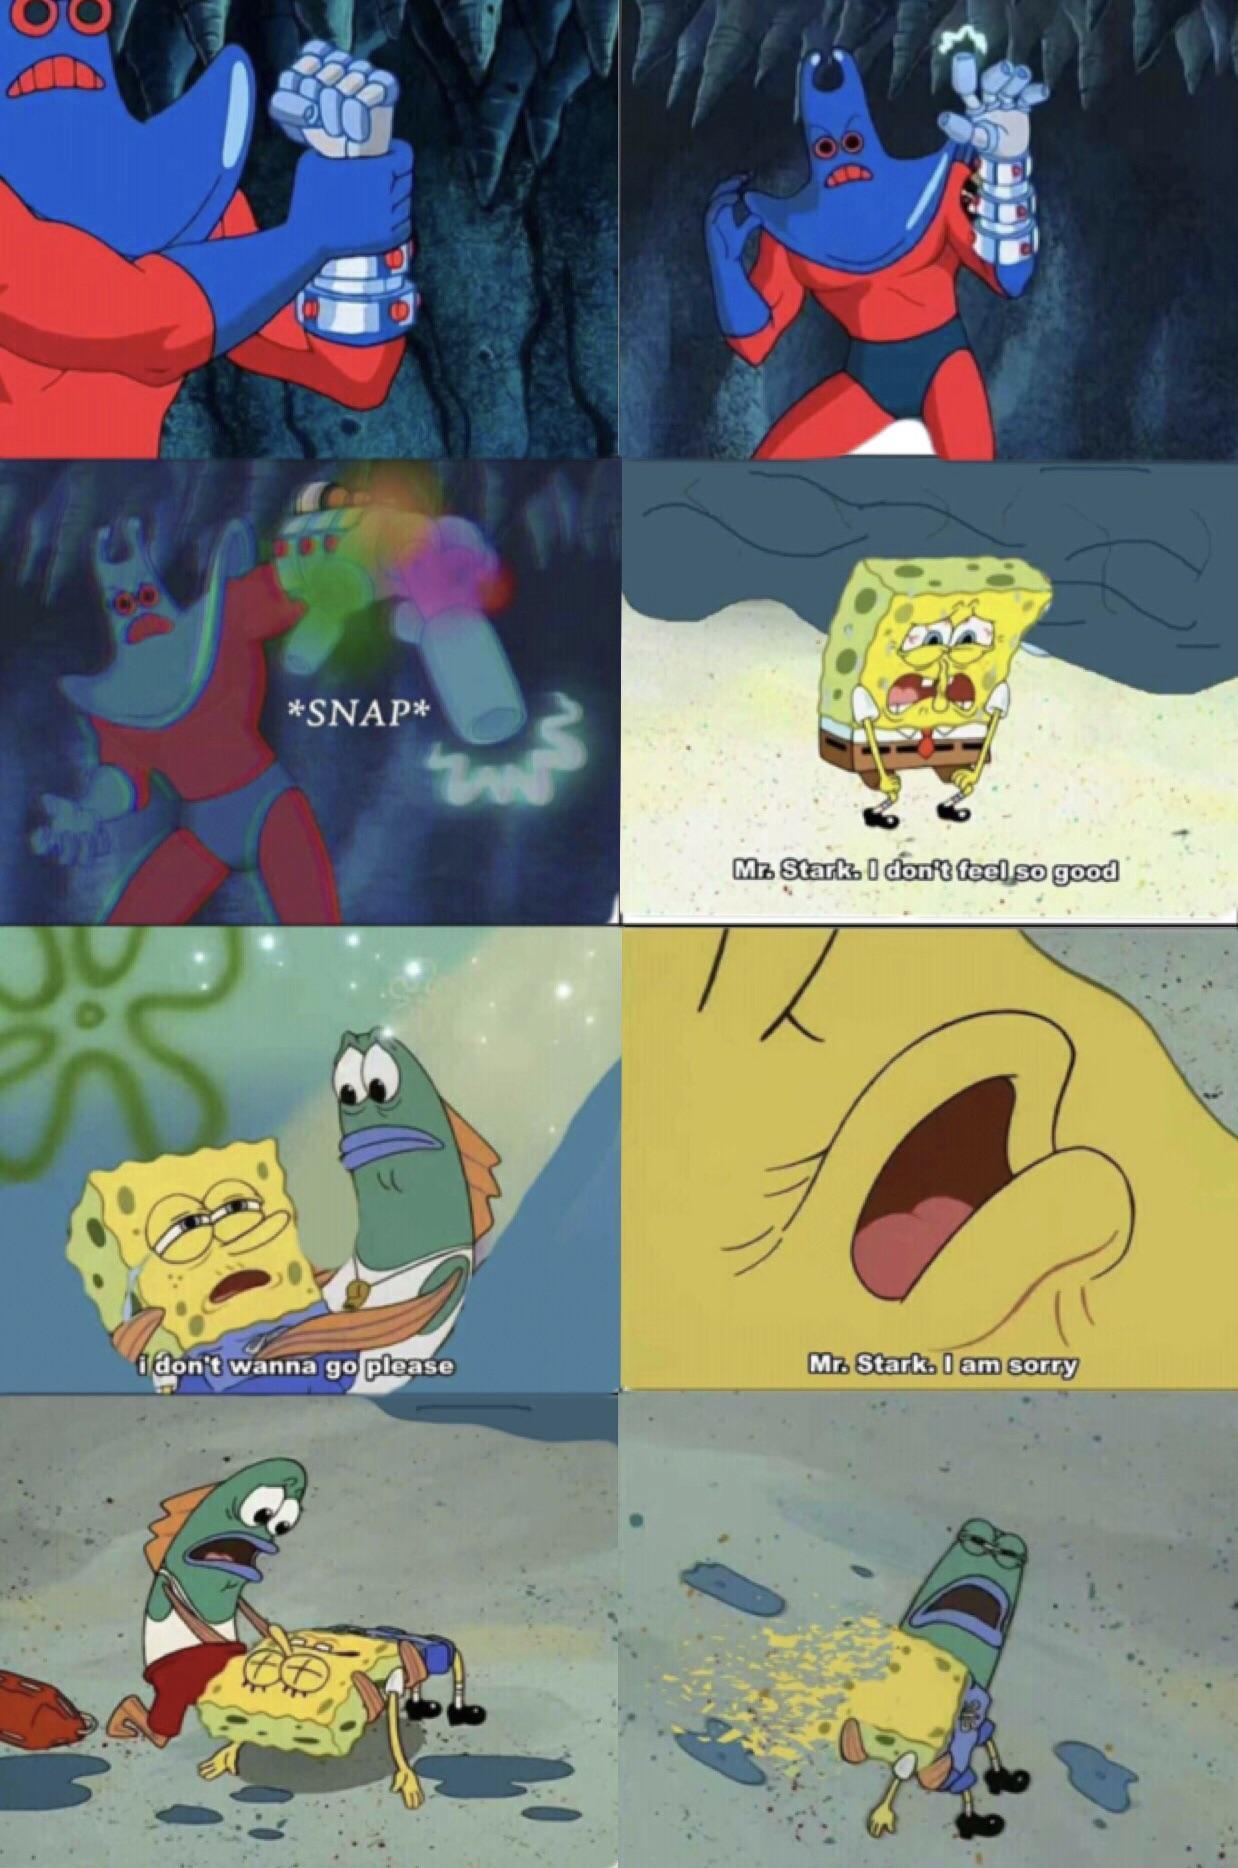 Man Avengers infinity  war was the best - meme